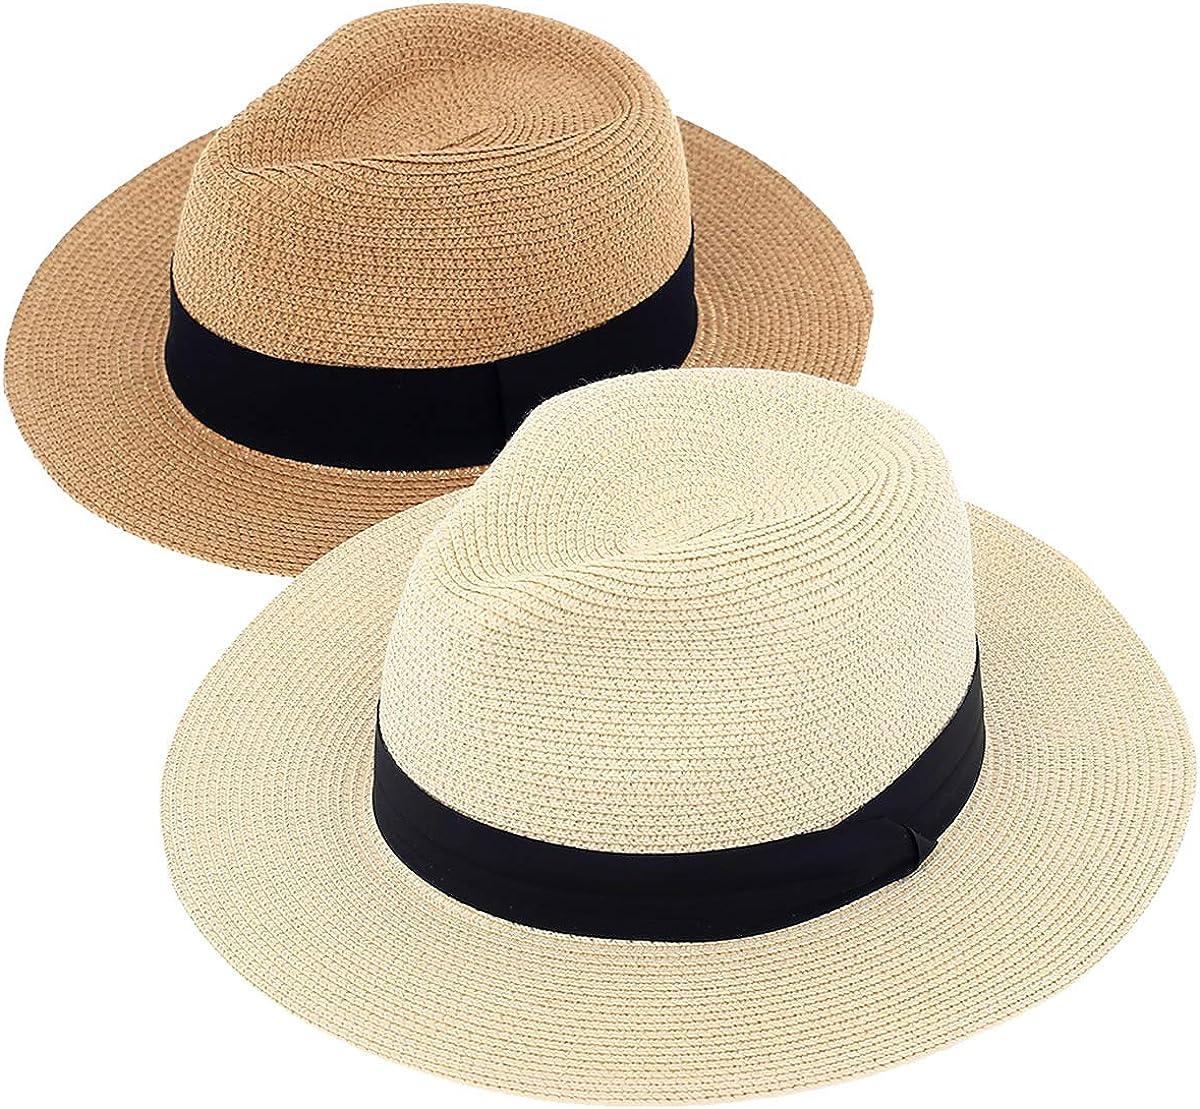 2-Pack Beach Hat for Women Summer Straw Sun Hats Wide Brim Fashion Hat Roll Up